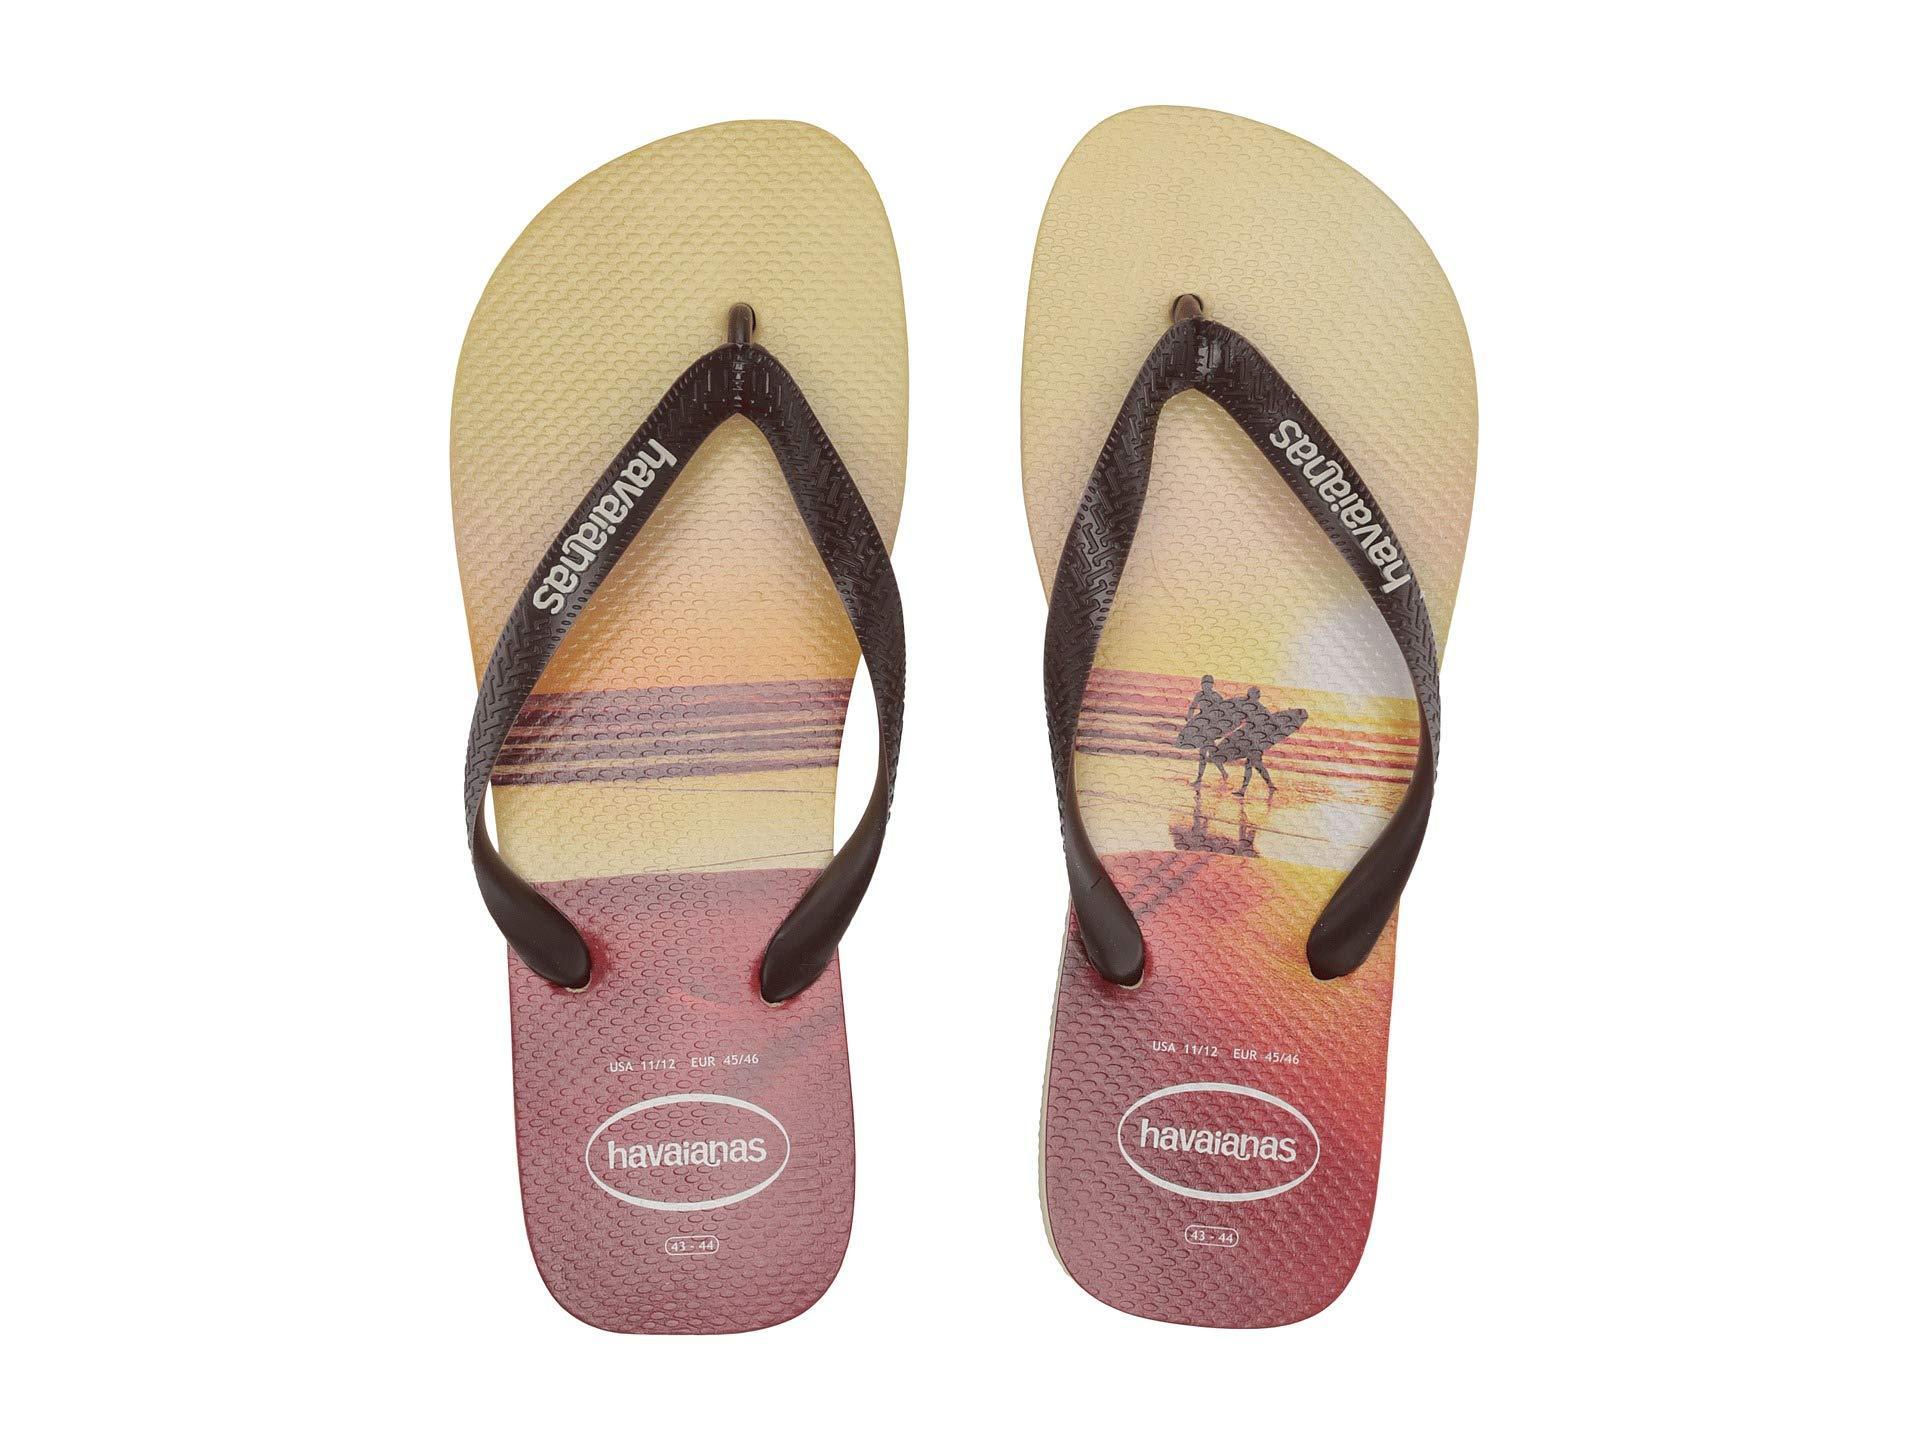 89b41380c002ec Lyst - Havaianas Flip-flop Sandals